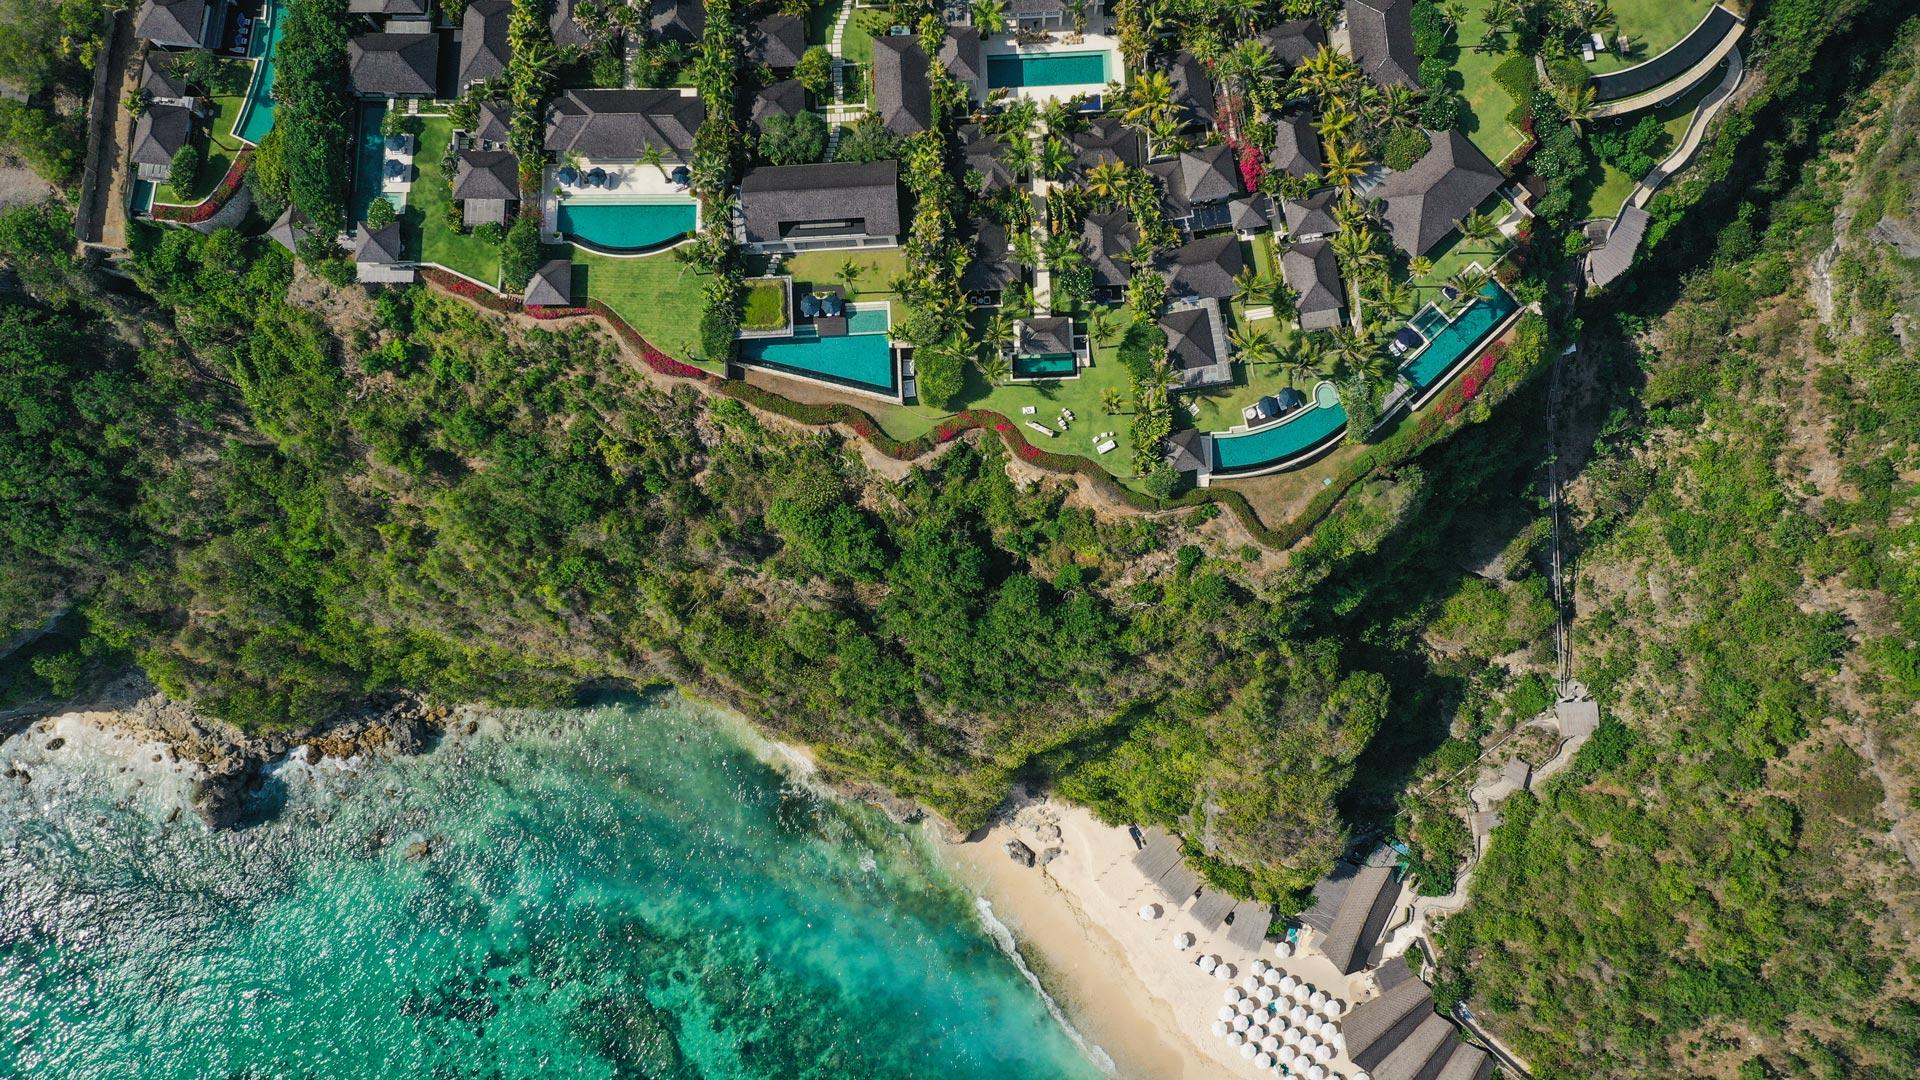 The Ungasan Clifftop Resort - Stunning Clifftop Villas in Bali